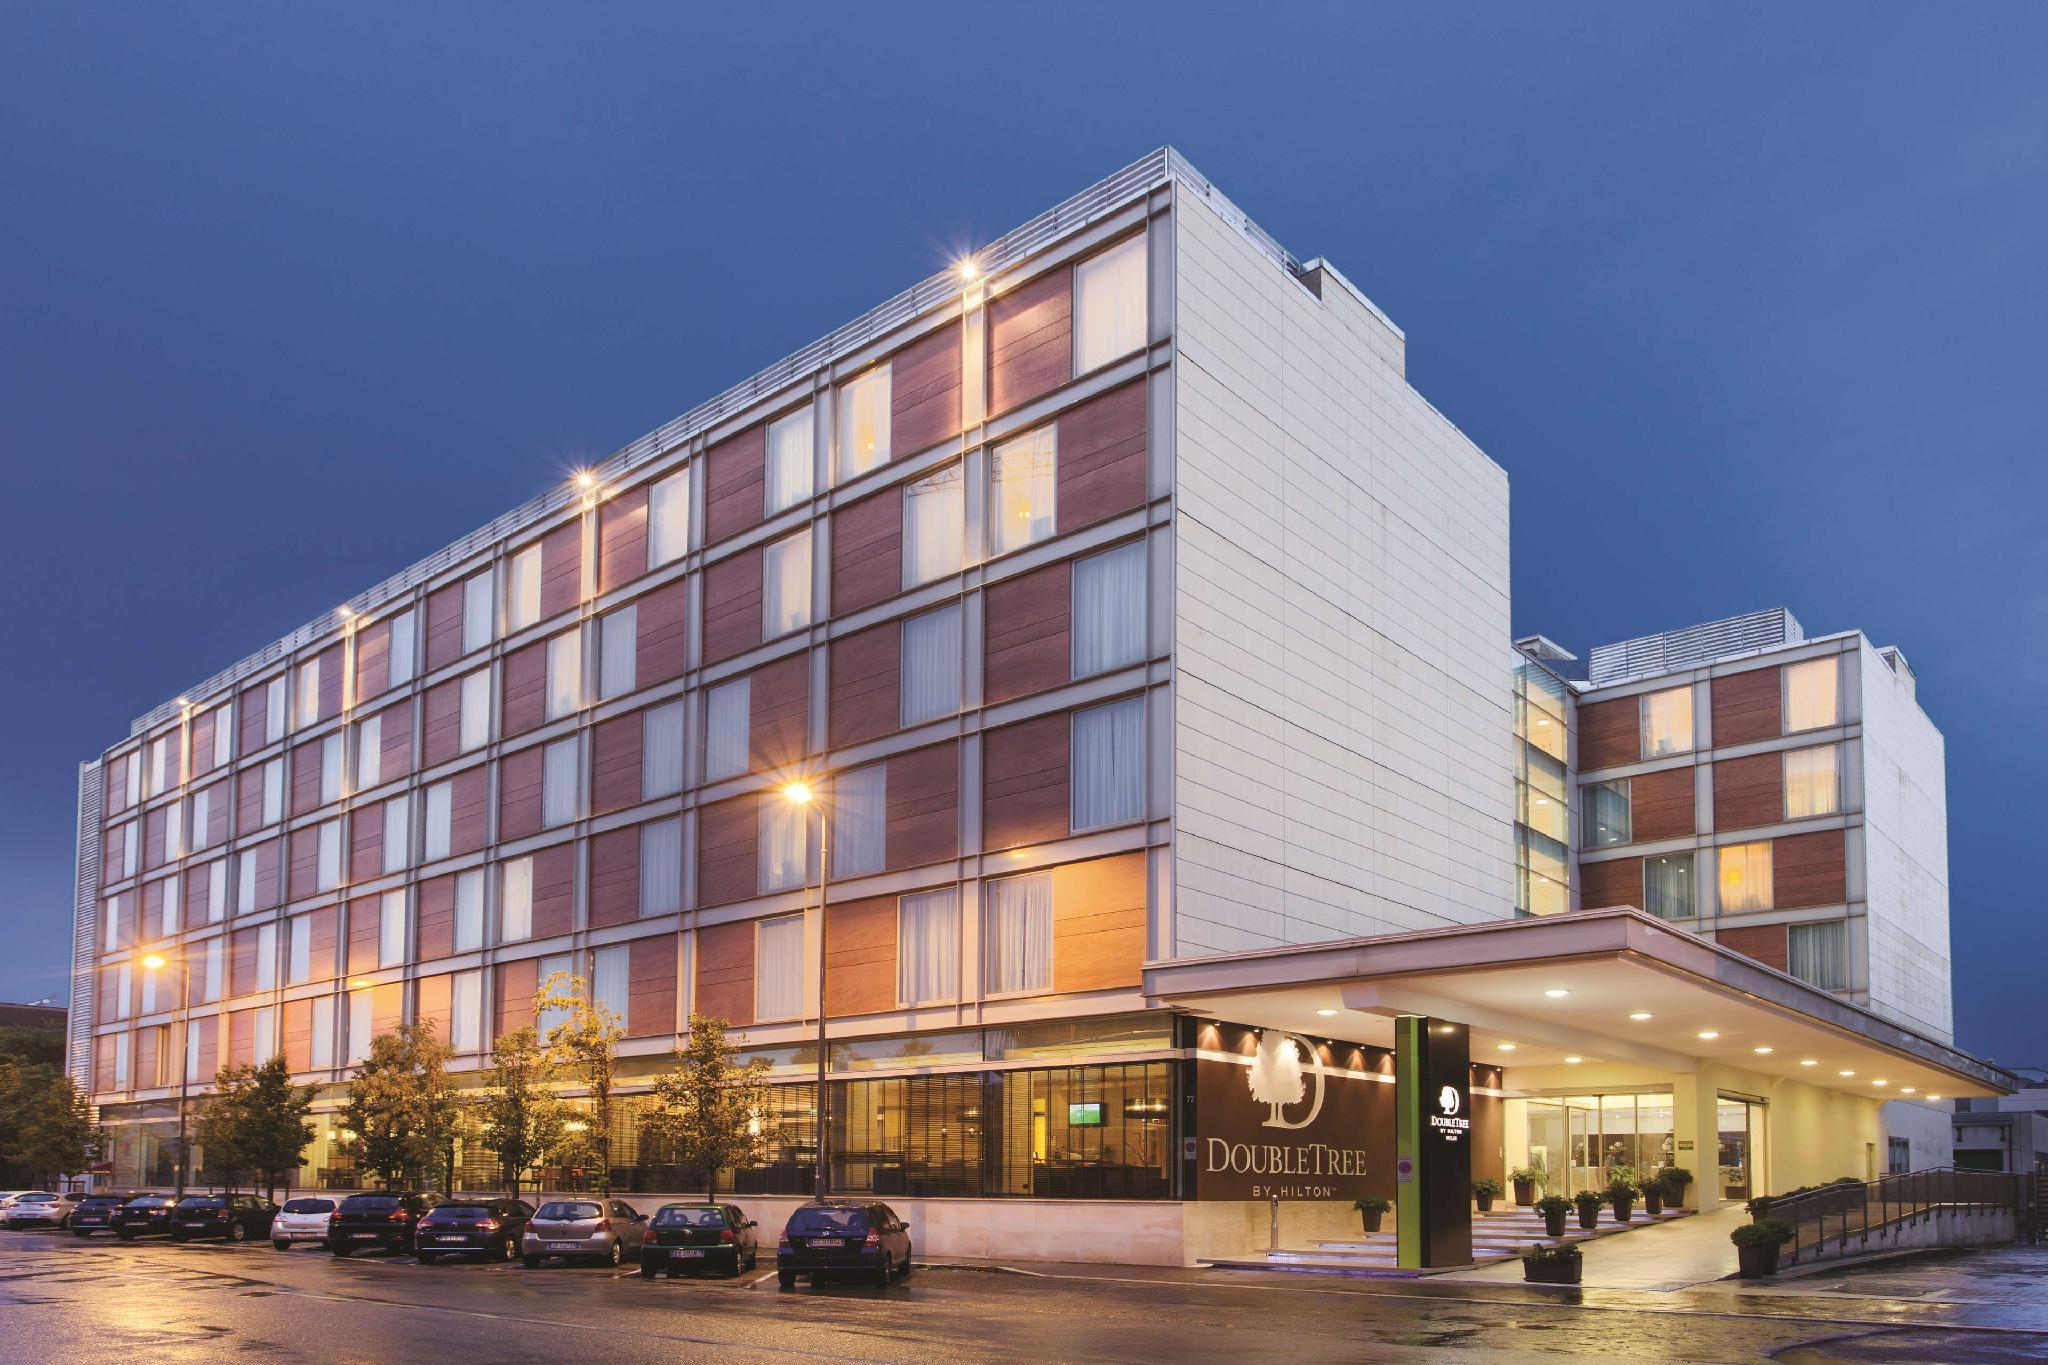 Doubletree By Hilton Milan Hotel